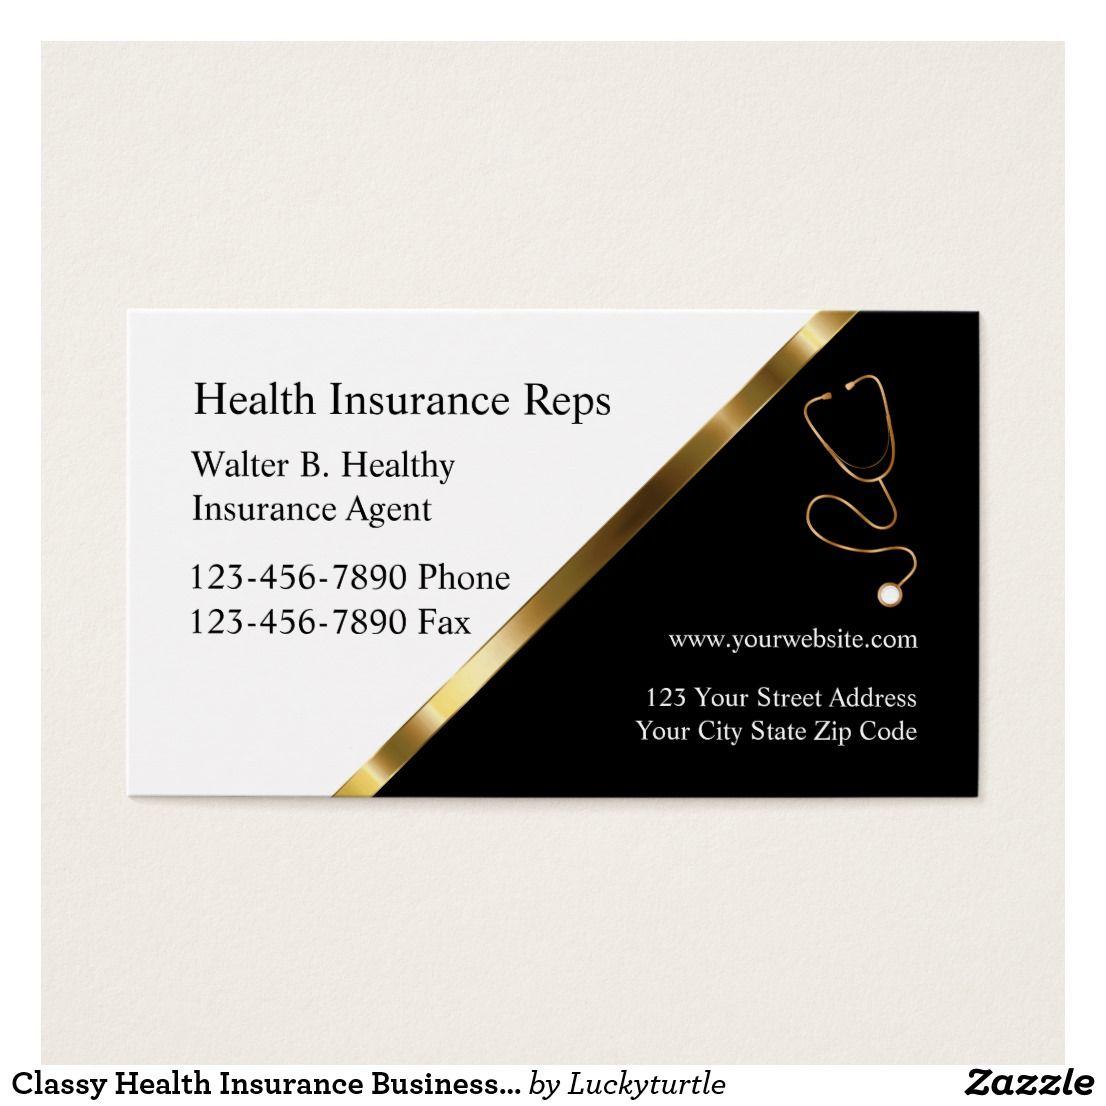 Classy health insurance business cards zazzleca